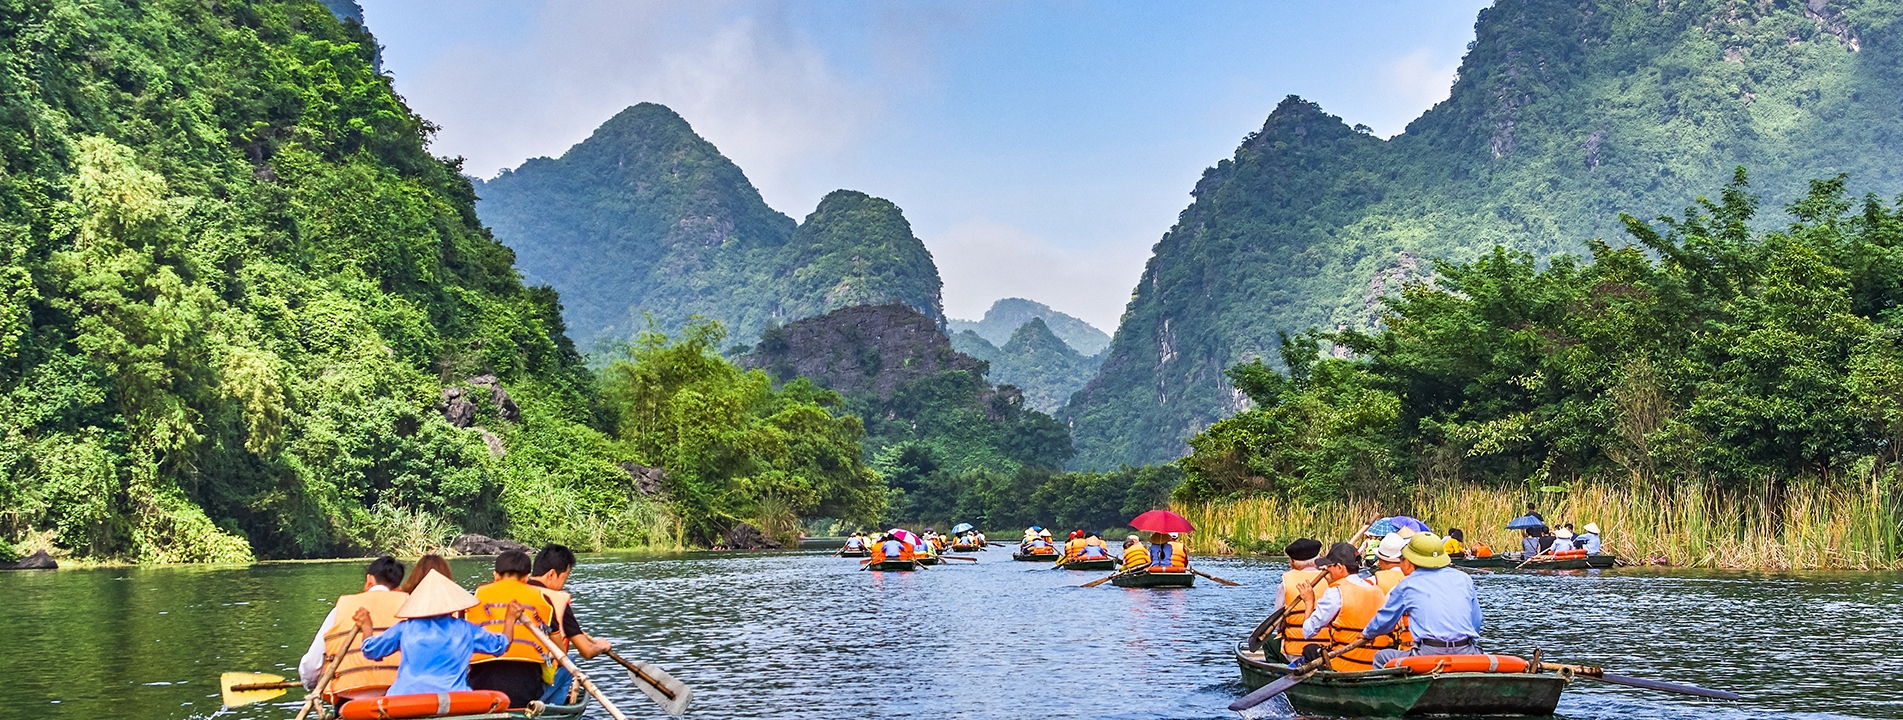 Northern Vietnam Countryside